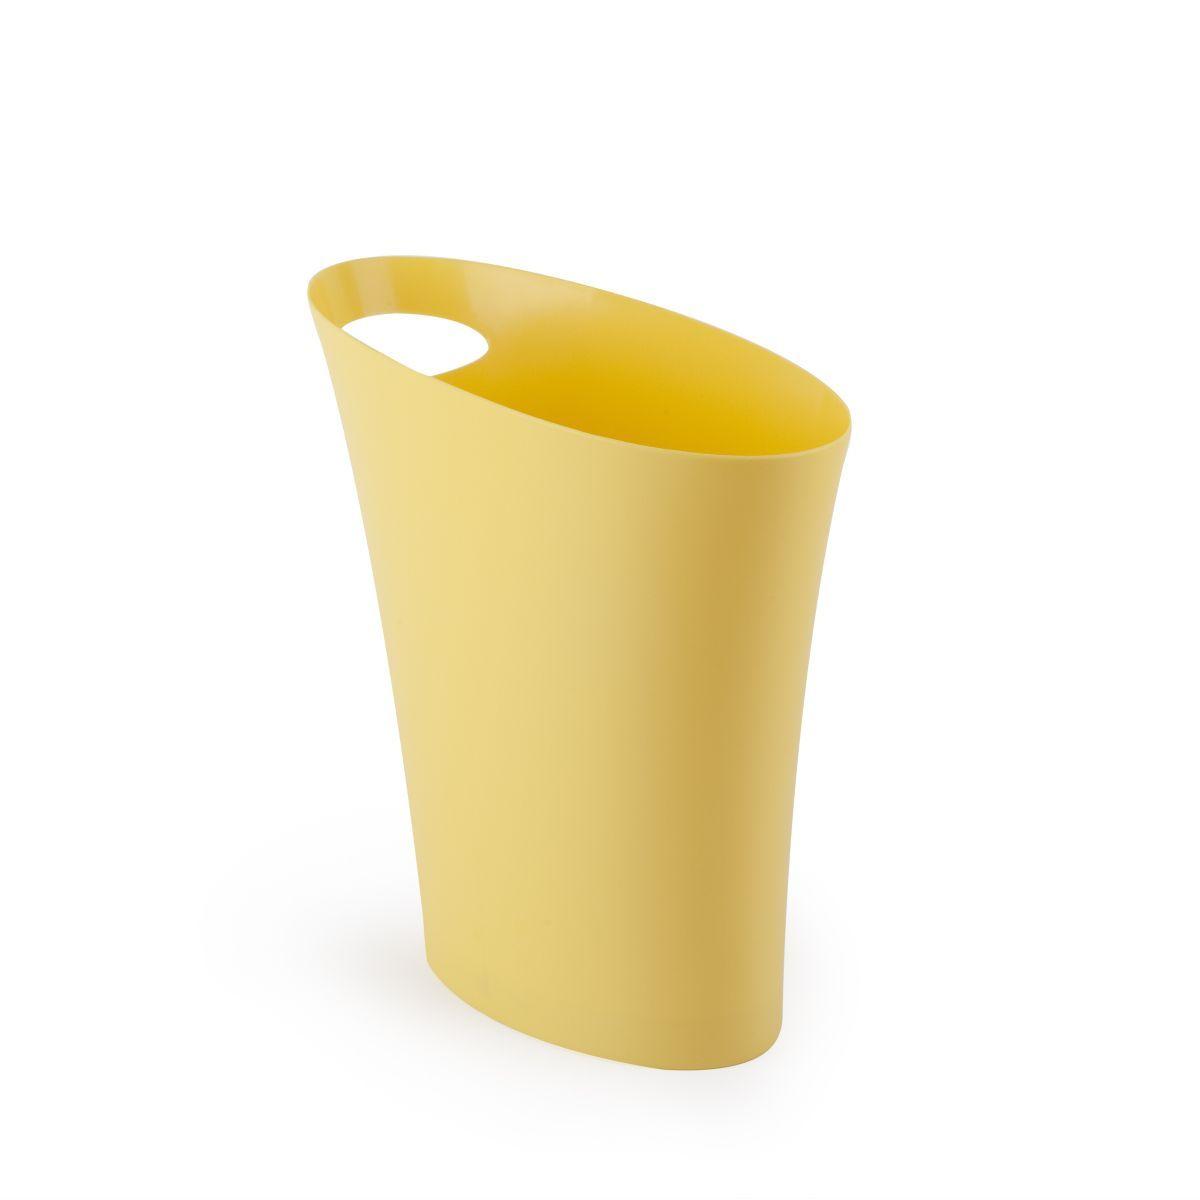 Контейнер для мусора Umbra  Skinny , цвет: желтый, 7,5 л - Аксессуары